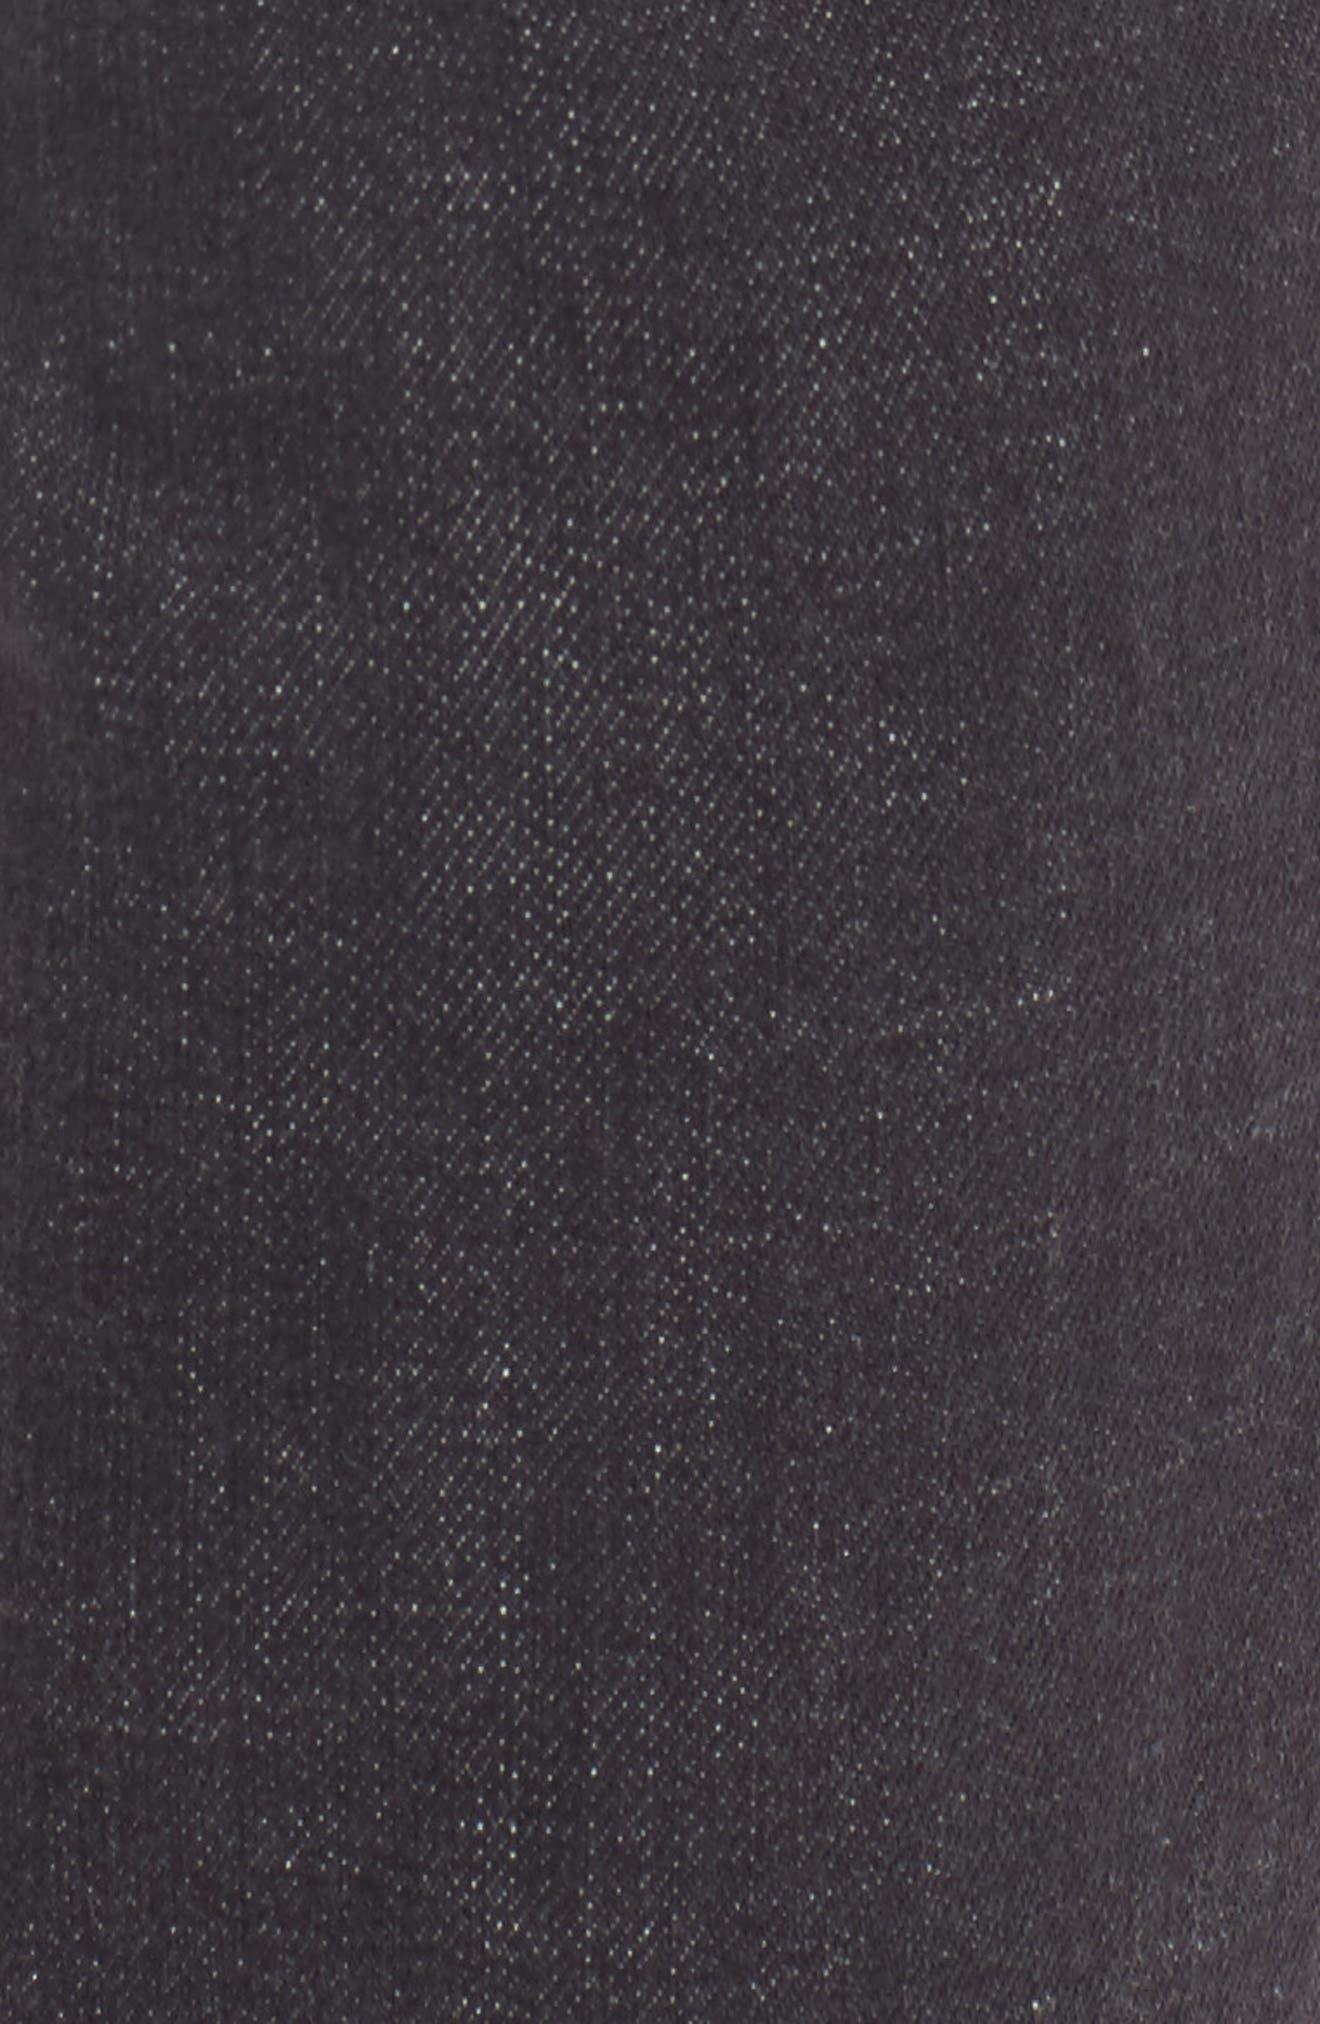 Biker Denim Jeans,                             Alternate thumbnail 5, color,                             010